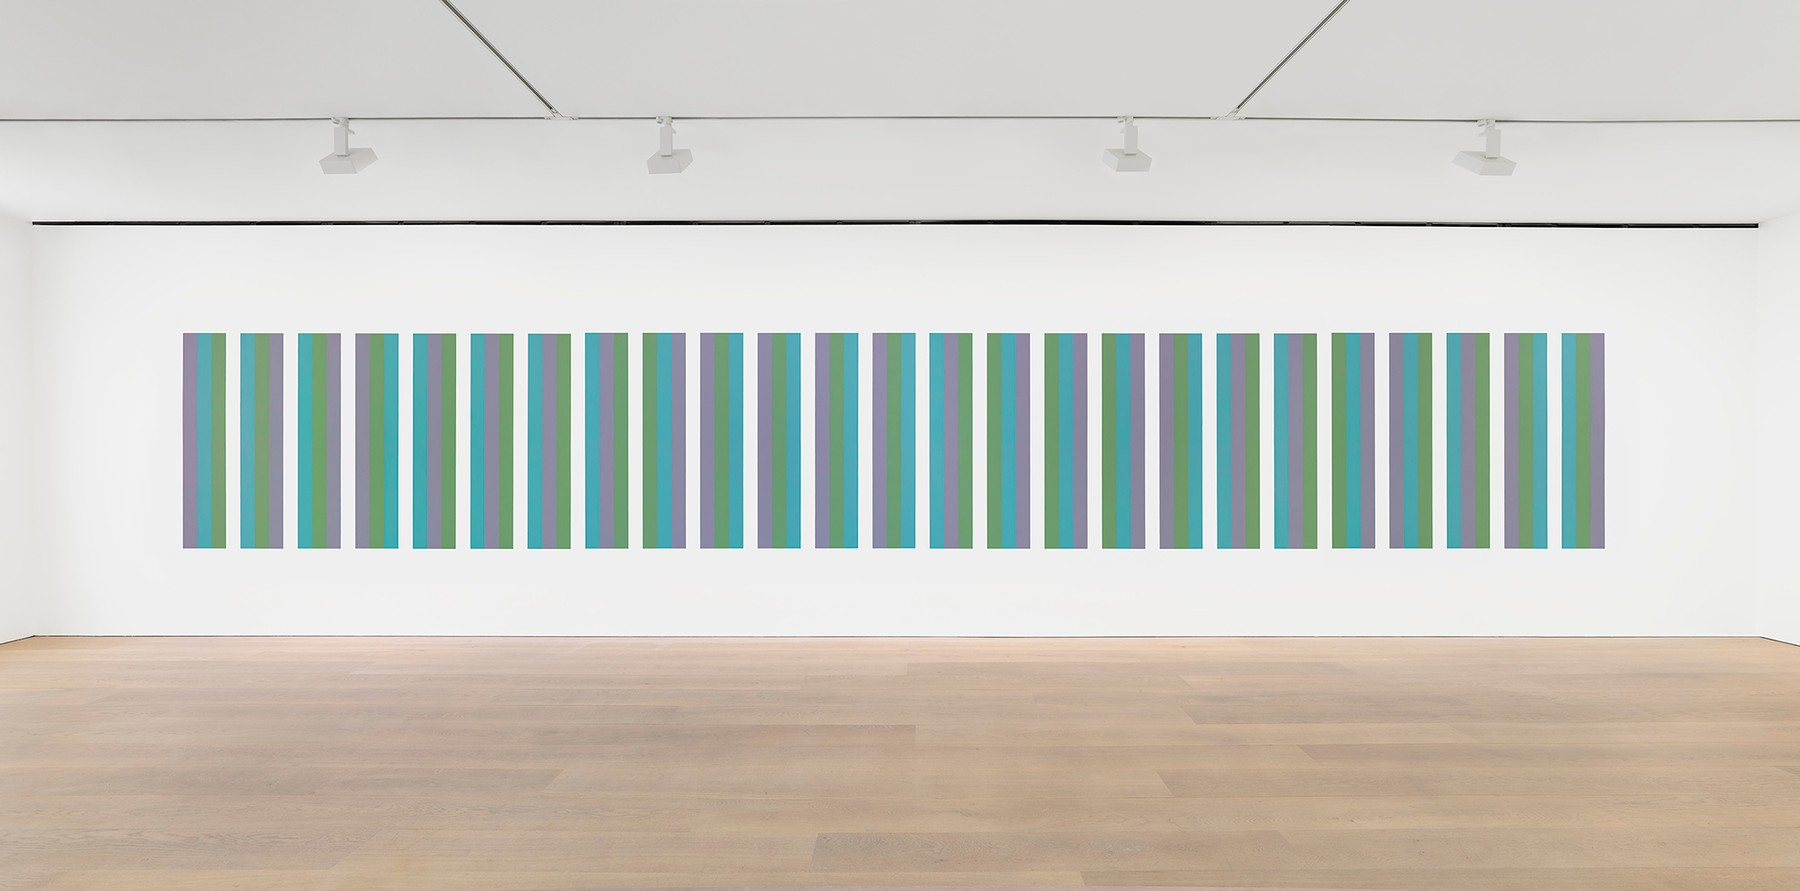 Bridget Riley, Intervals Wall Painting, 2021